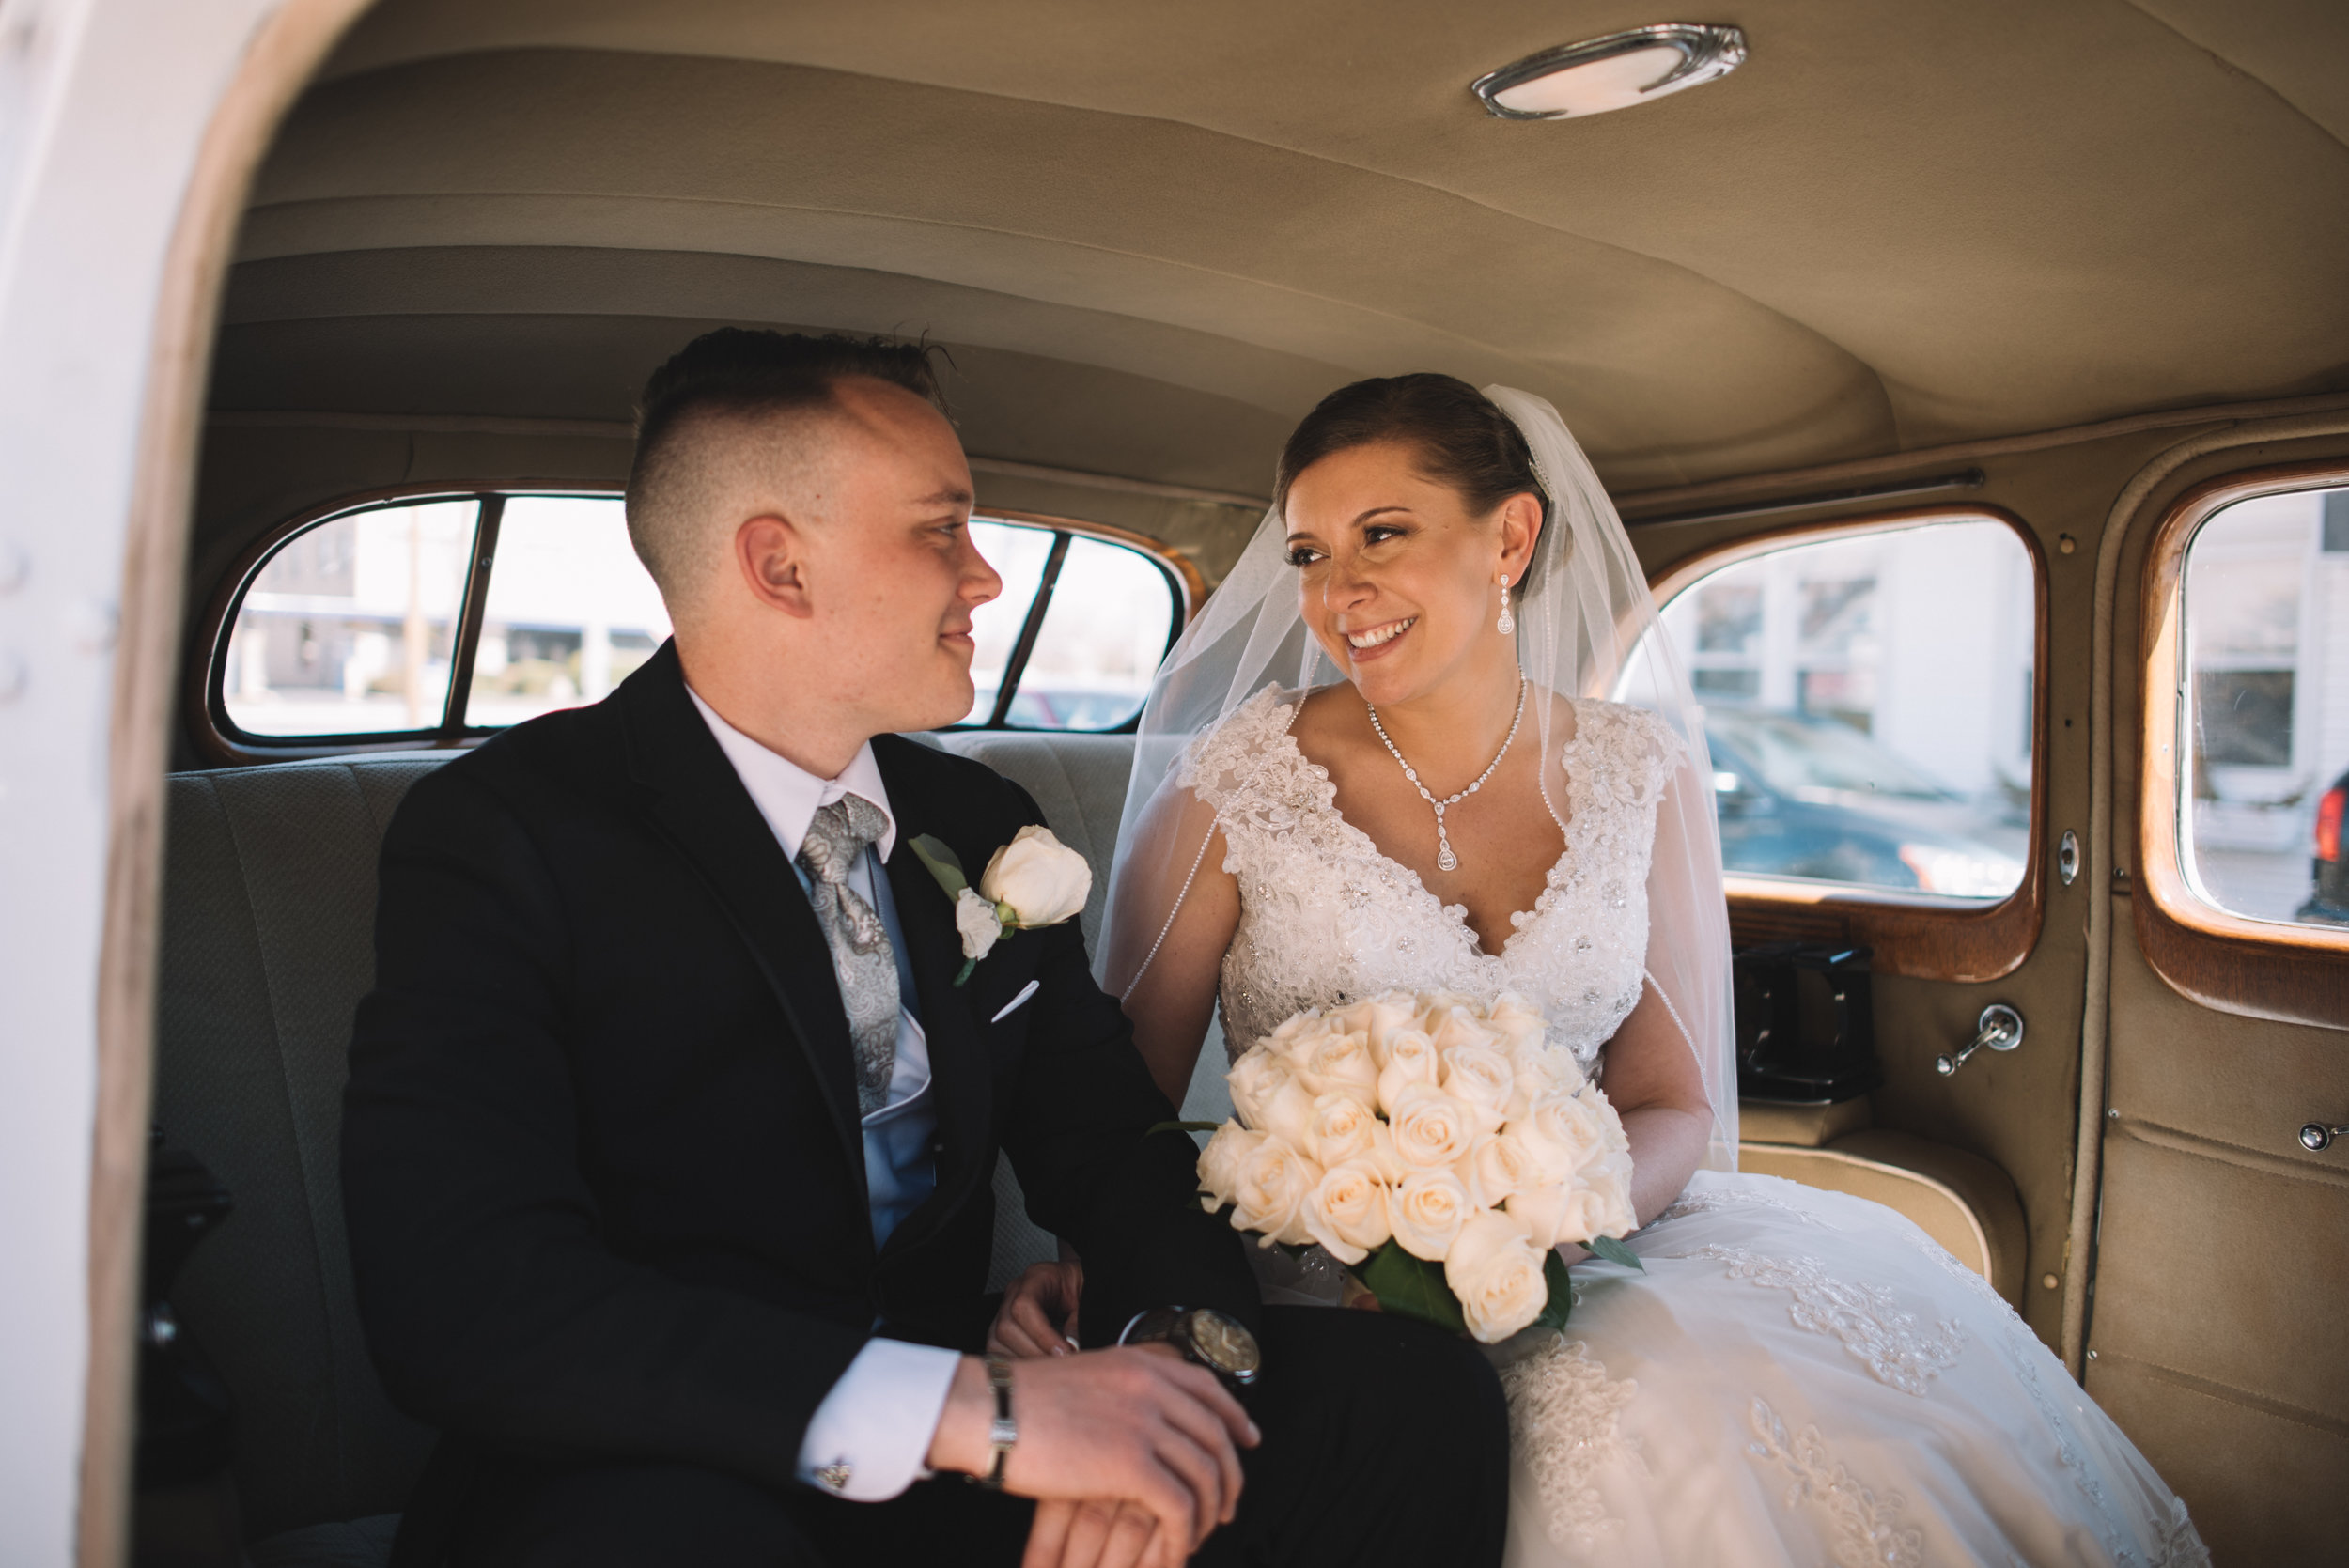 WeddingPhotos | NJPhotographer | Highlights-1-28.jpg